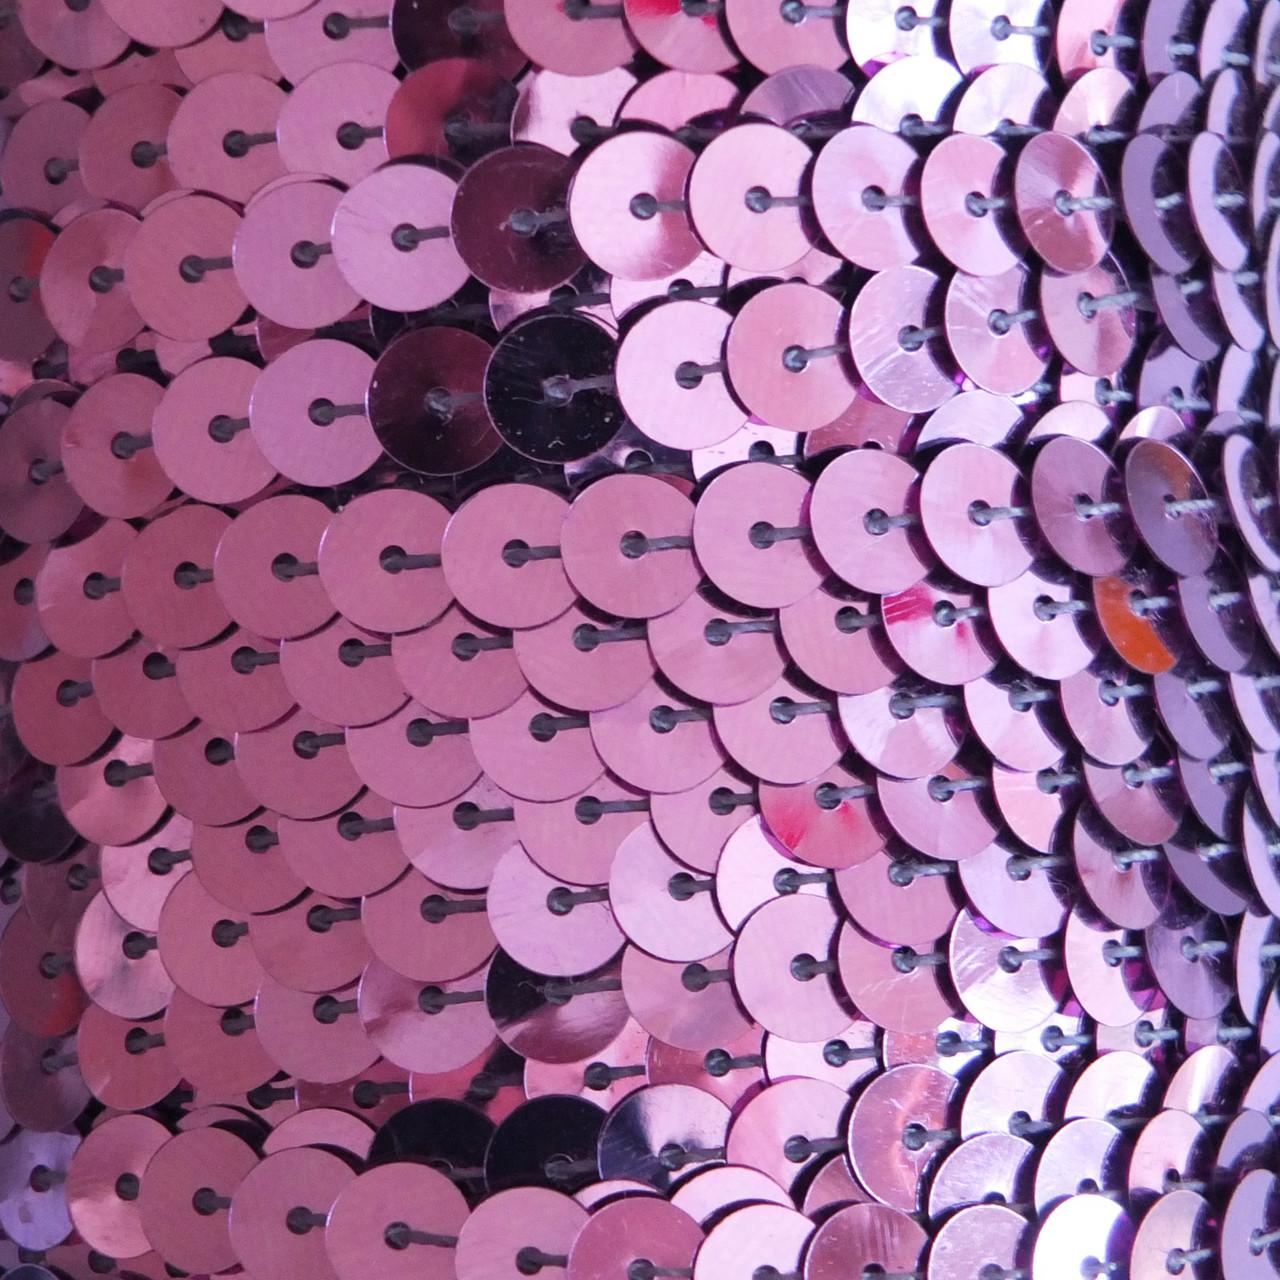 6mm Flat Round Sequin Trim Lavender Pink Shiny Metallic